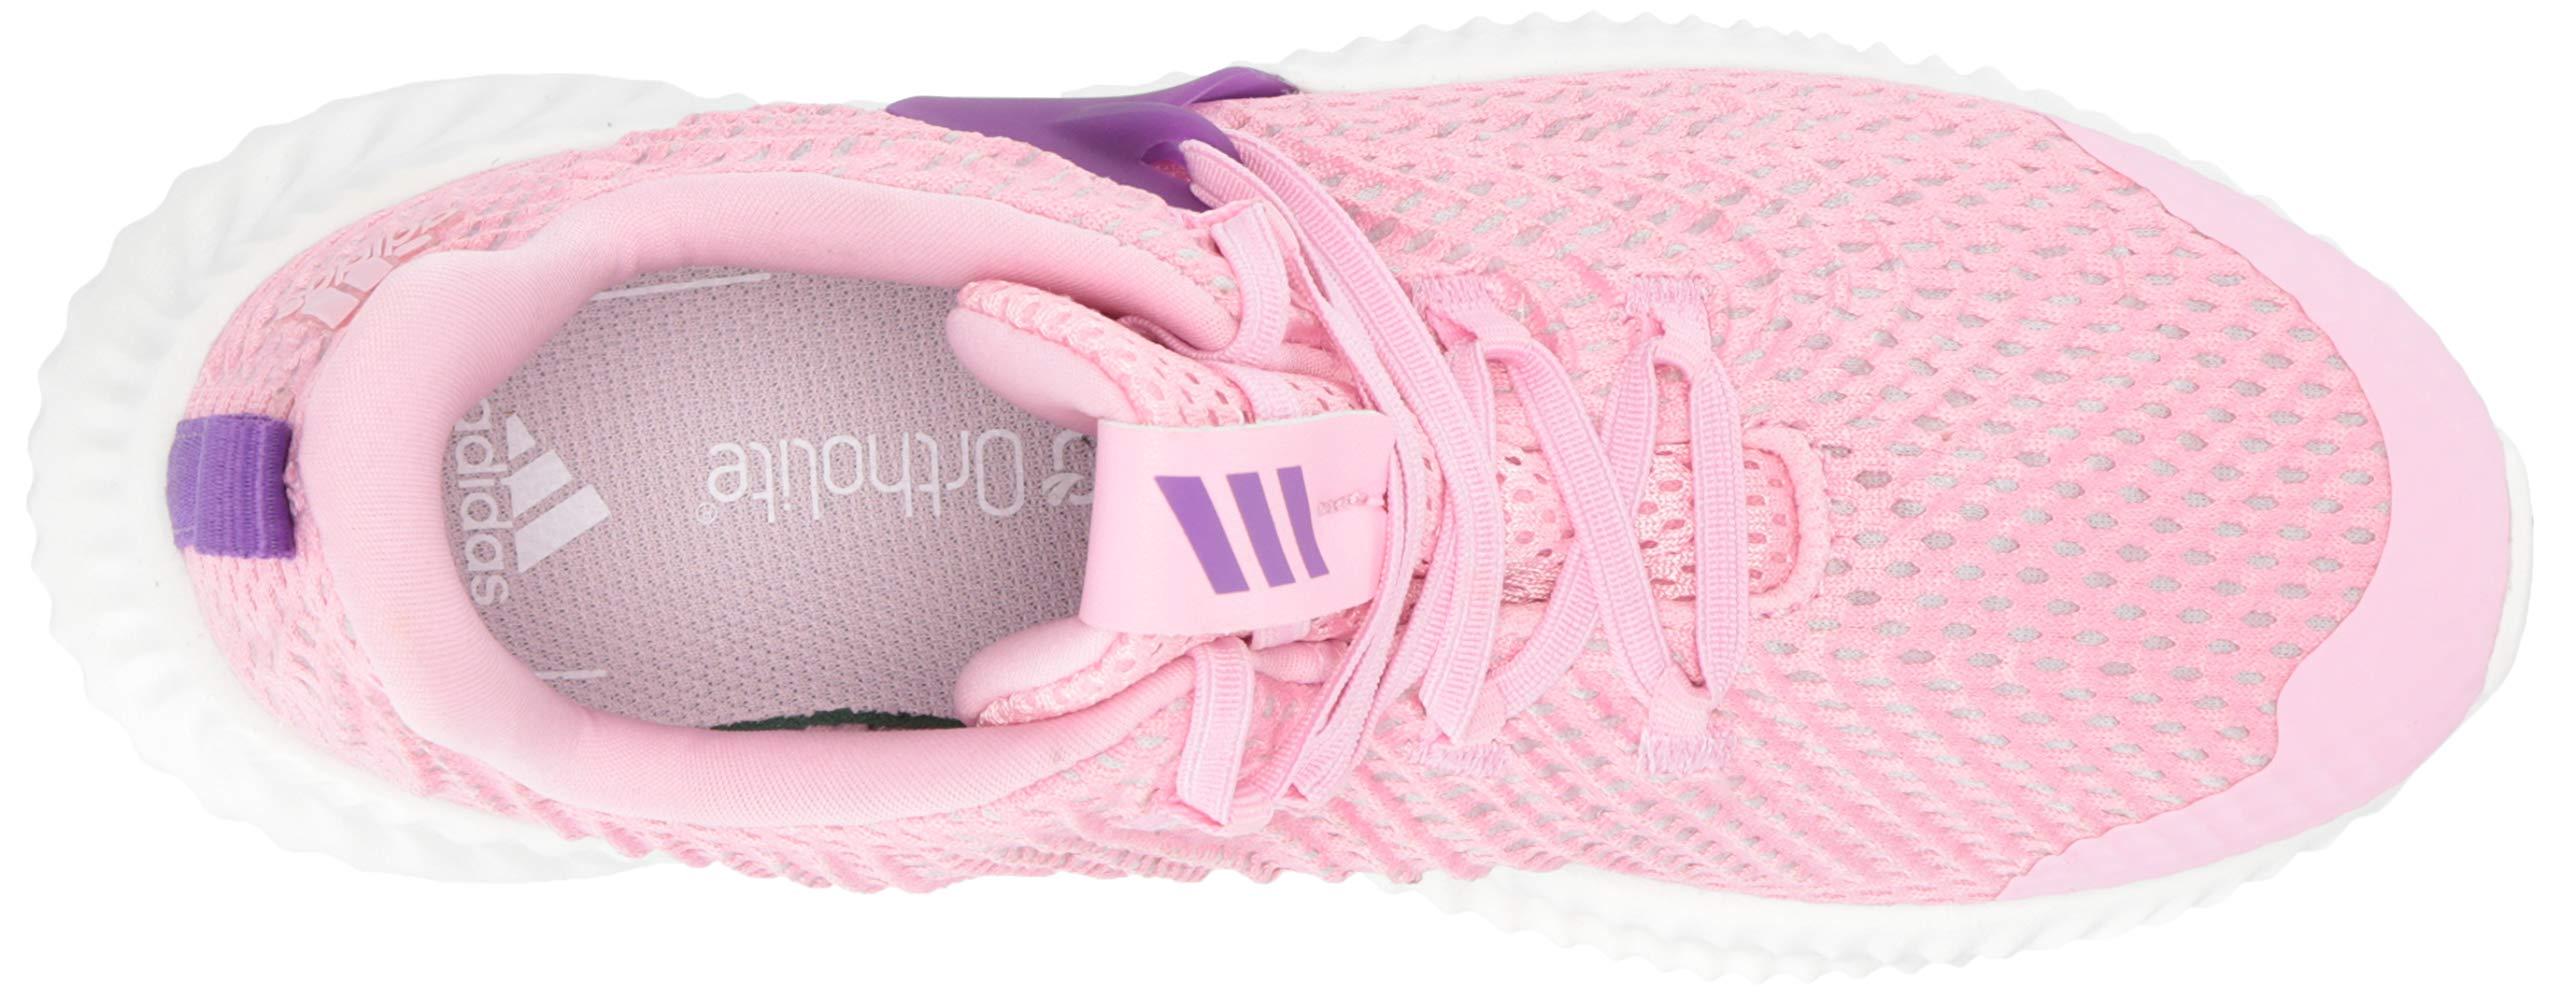 Adidas Kids Alphabounce Instinct, true pink/active purple/cloud white 2.5 M US Little Kid by adidas (Image #8)